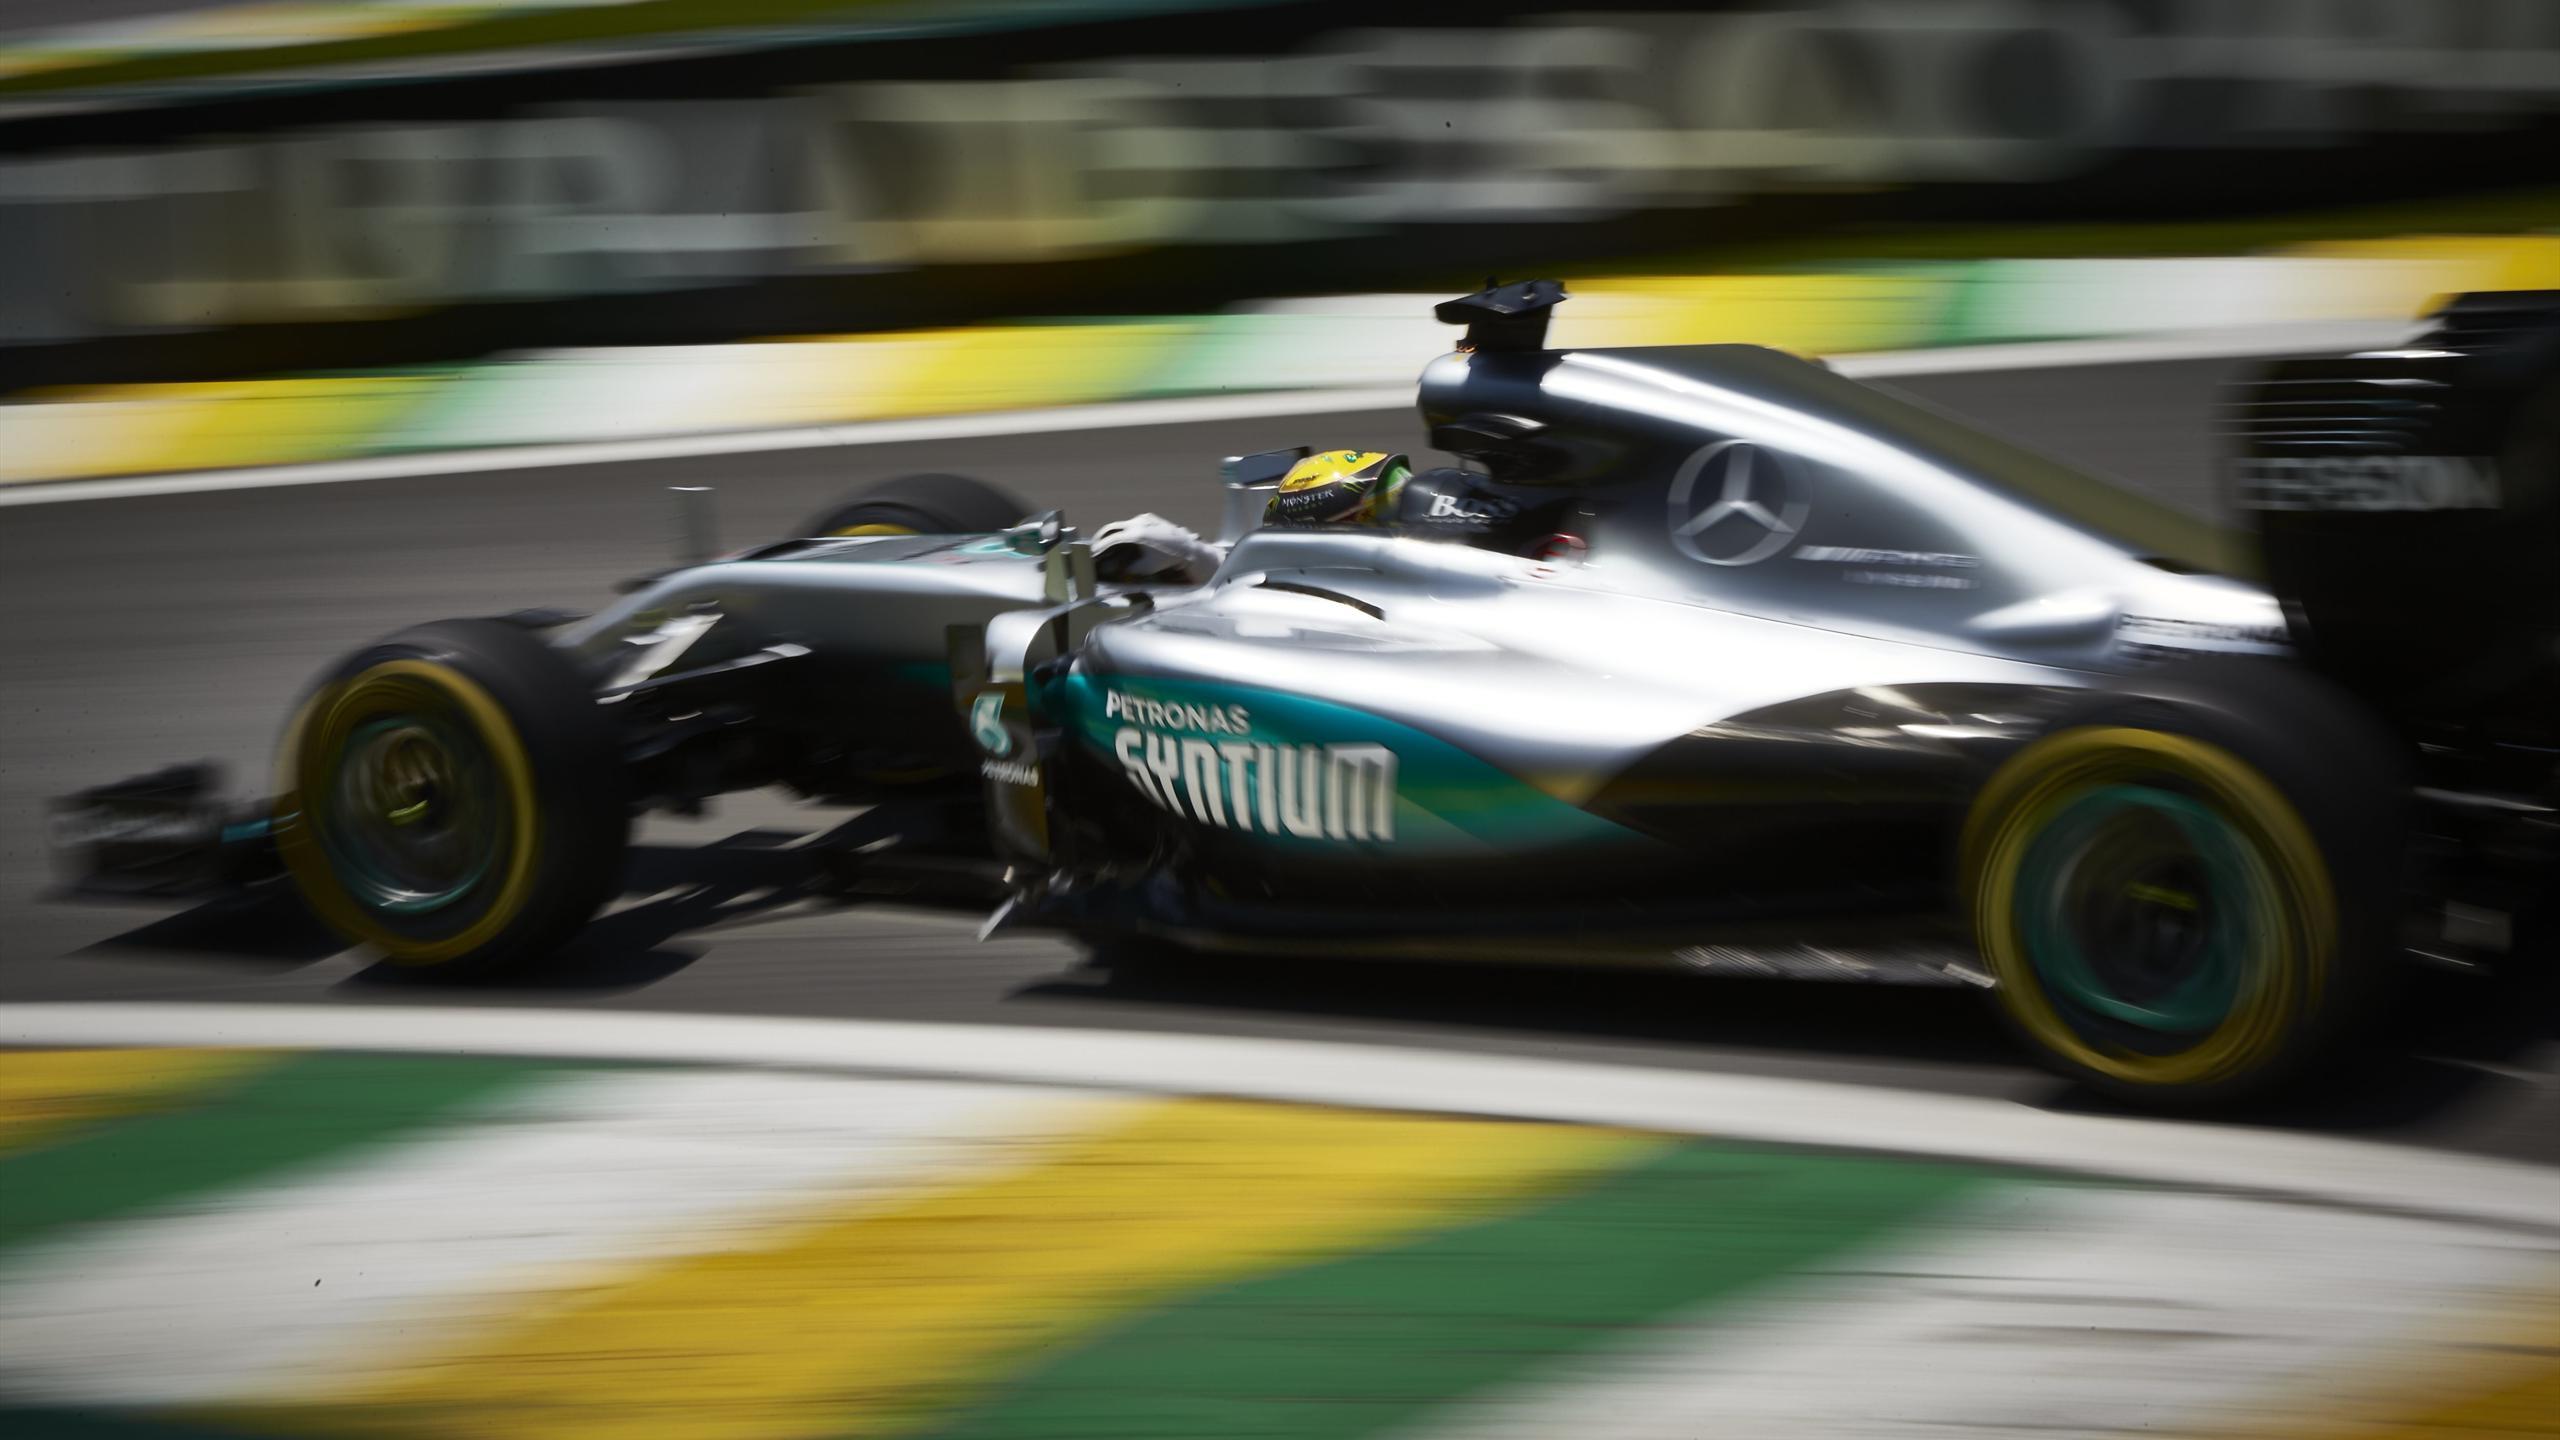 Lewis Hamilton (Mercedes) - GP of Brazil 2016